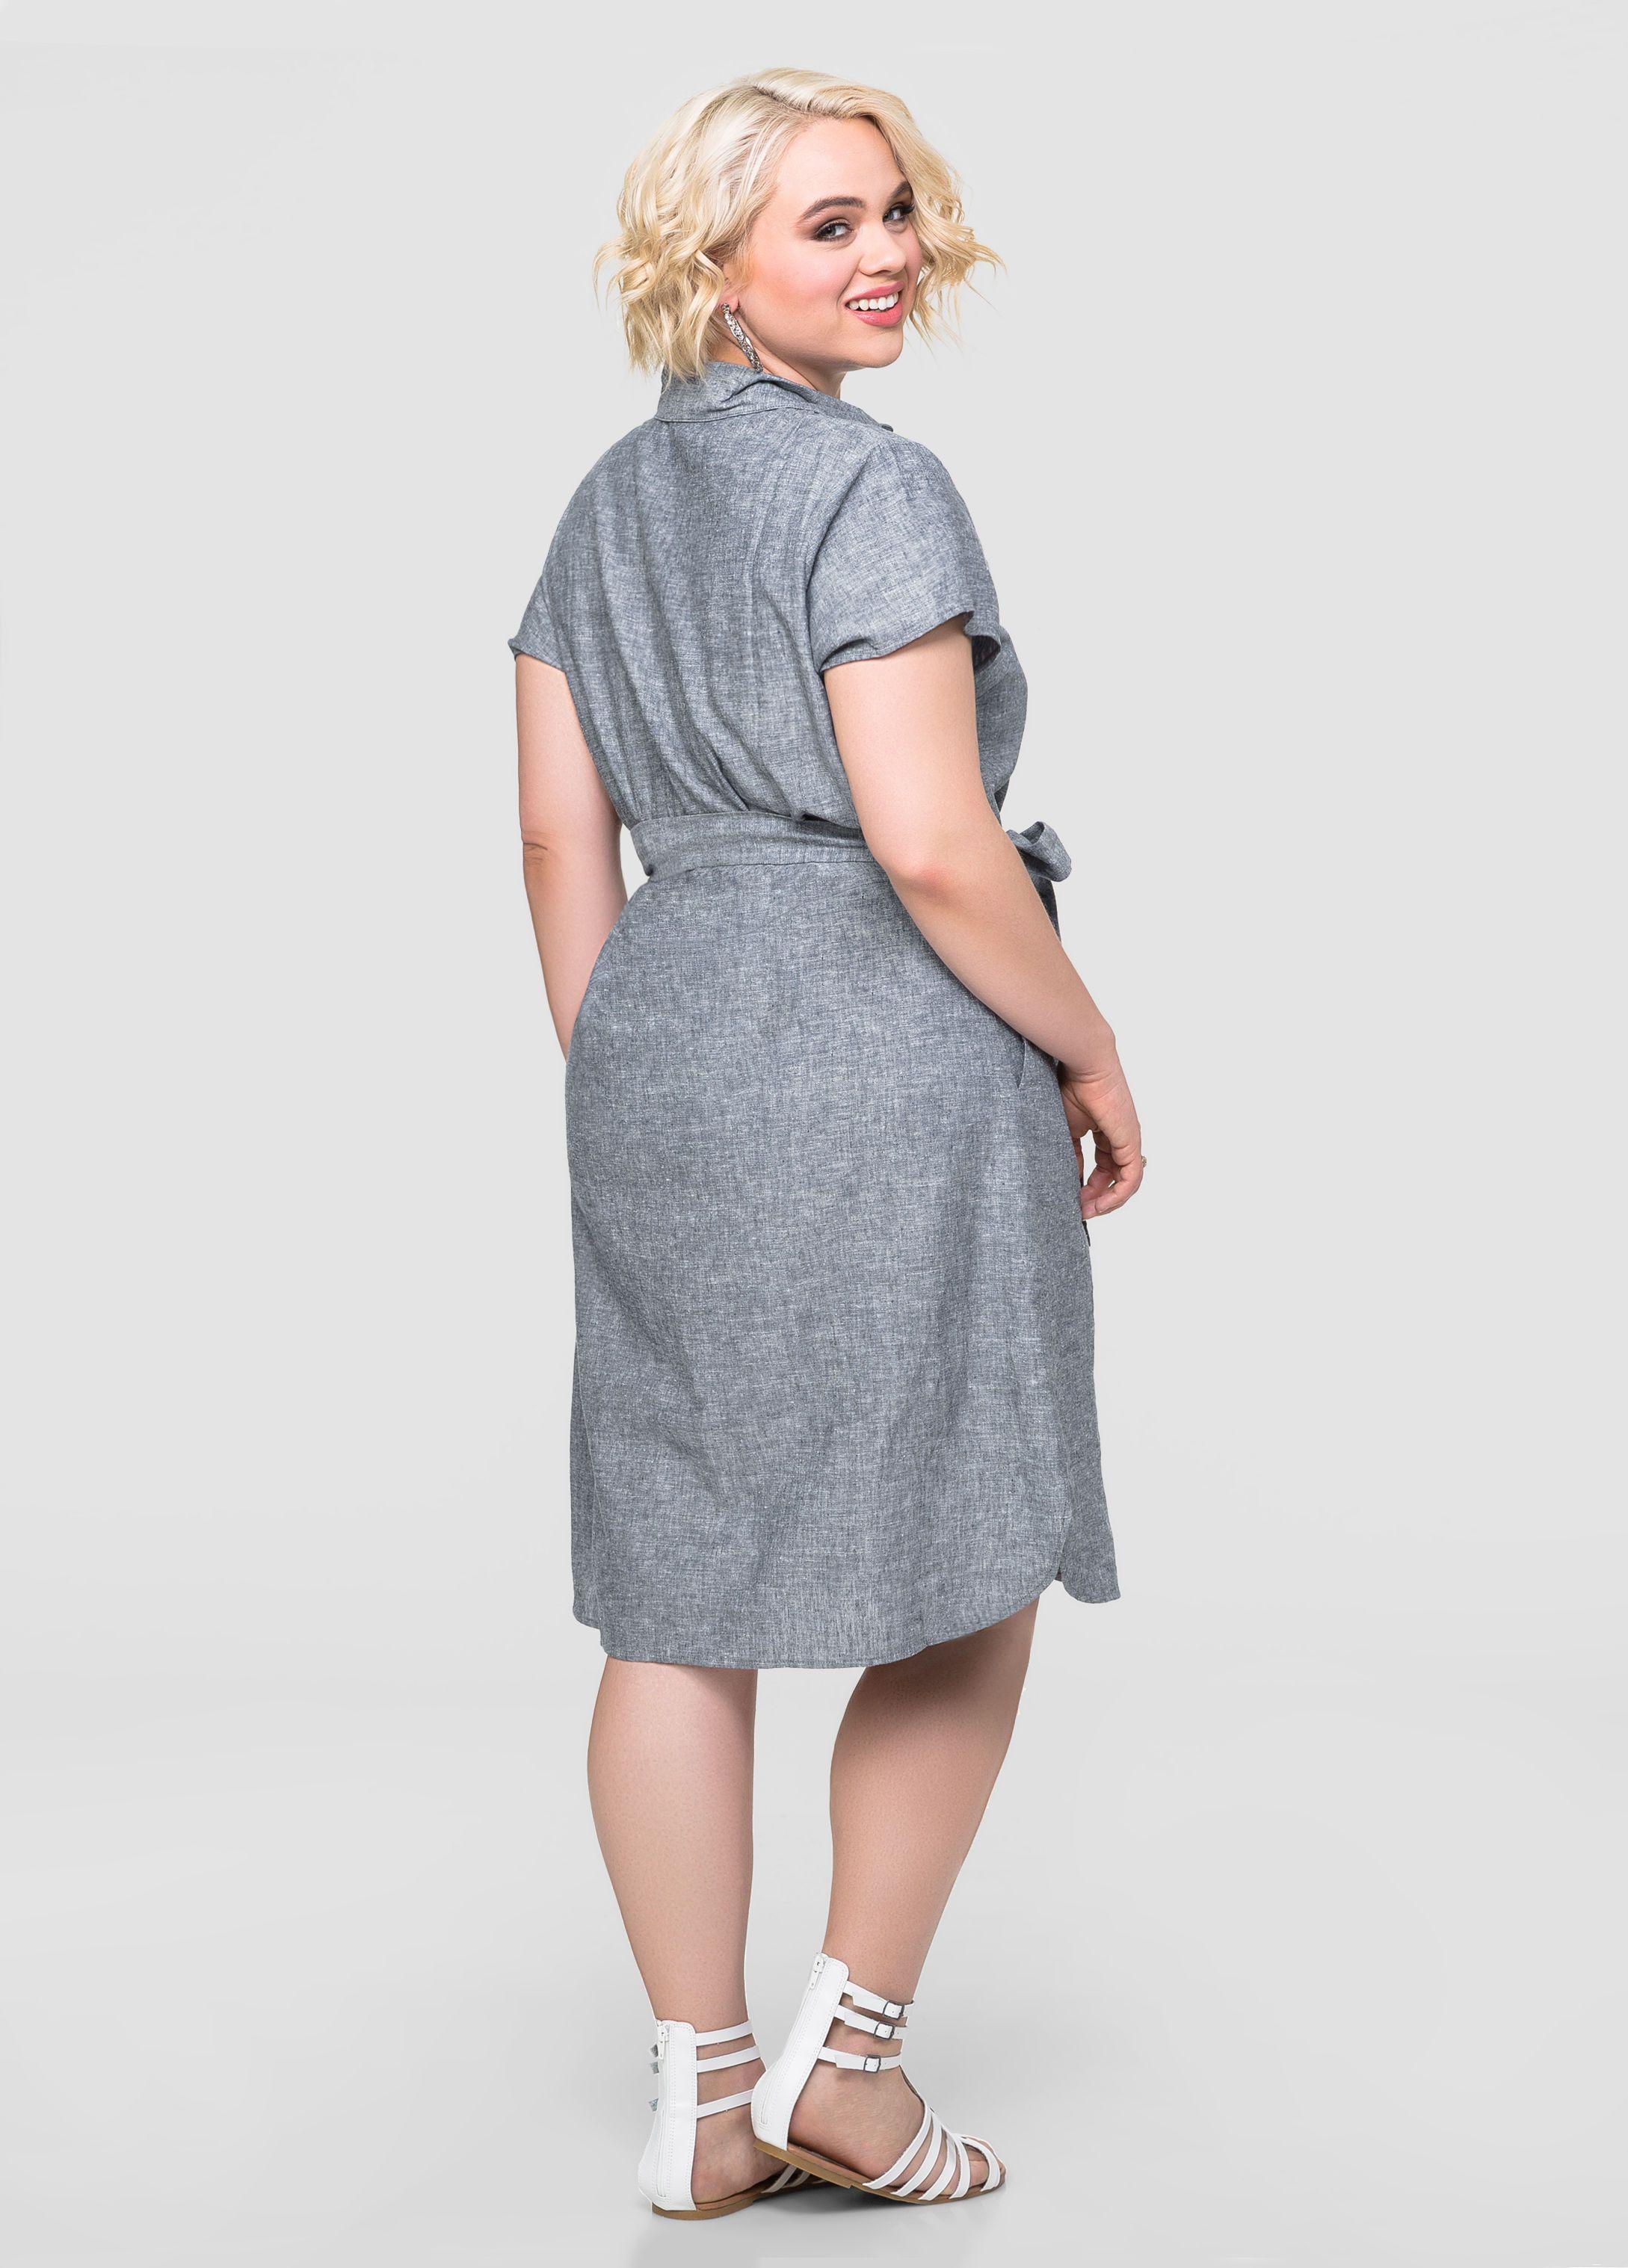 Linen Chambray Shirt Dress Ashley Stewart Kirby Cernosek Ashley